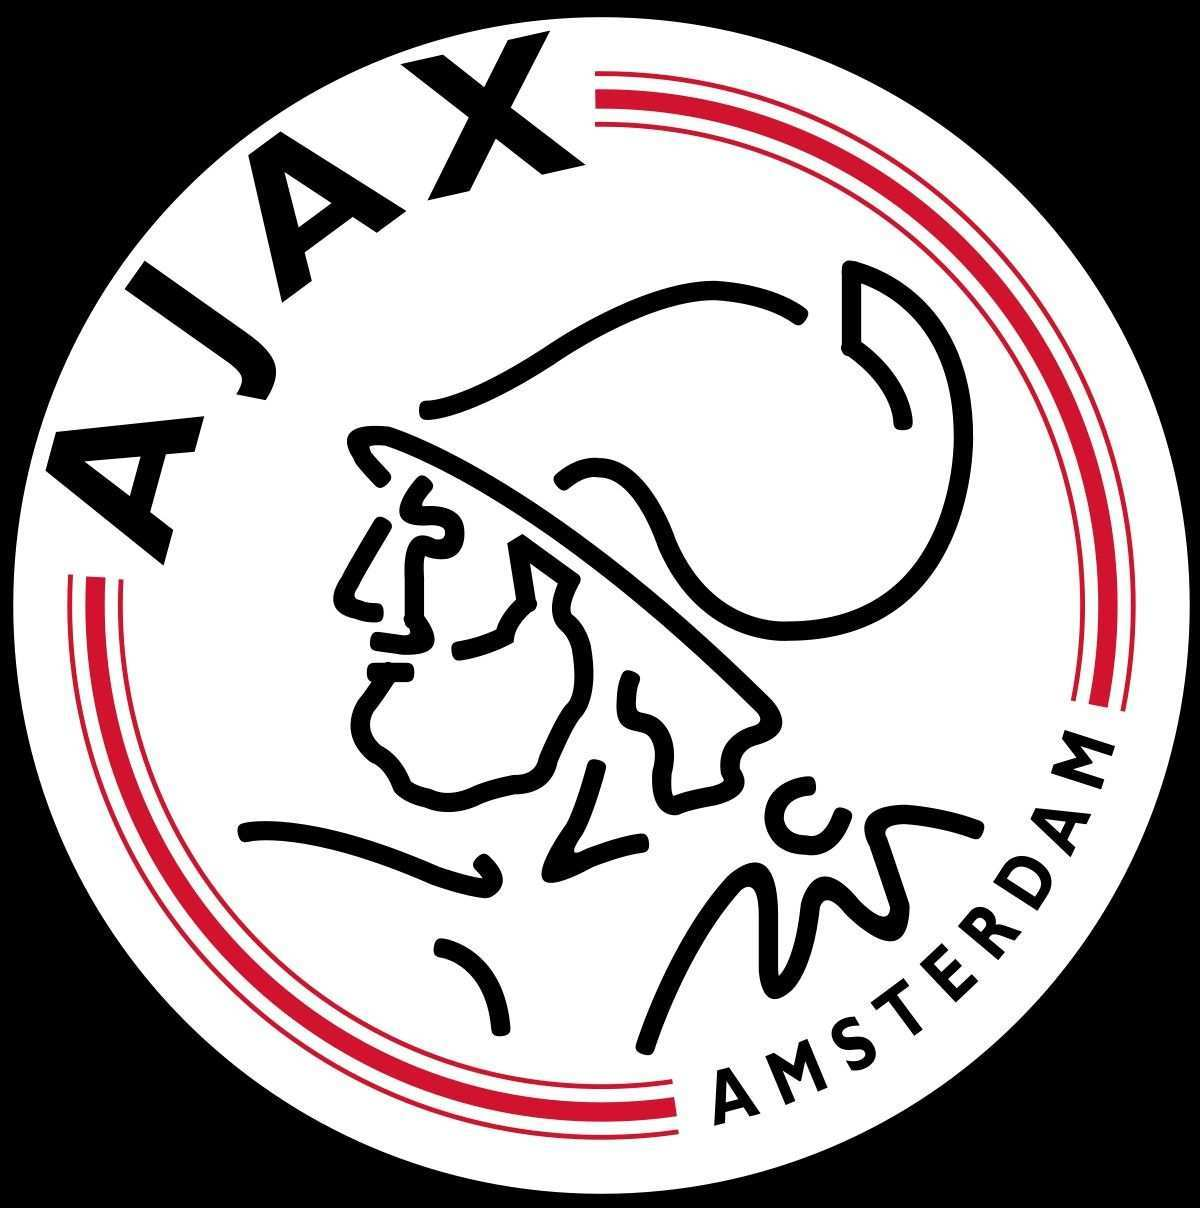 Kleurplaten Ajax Logo